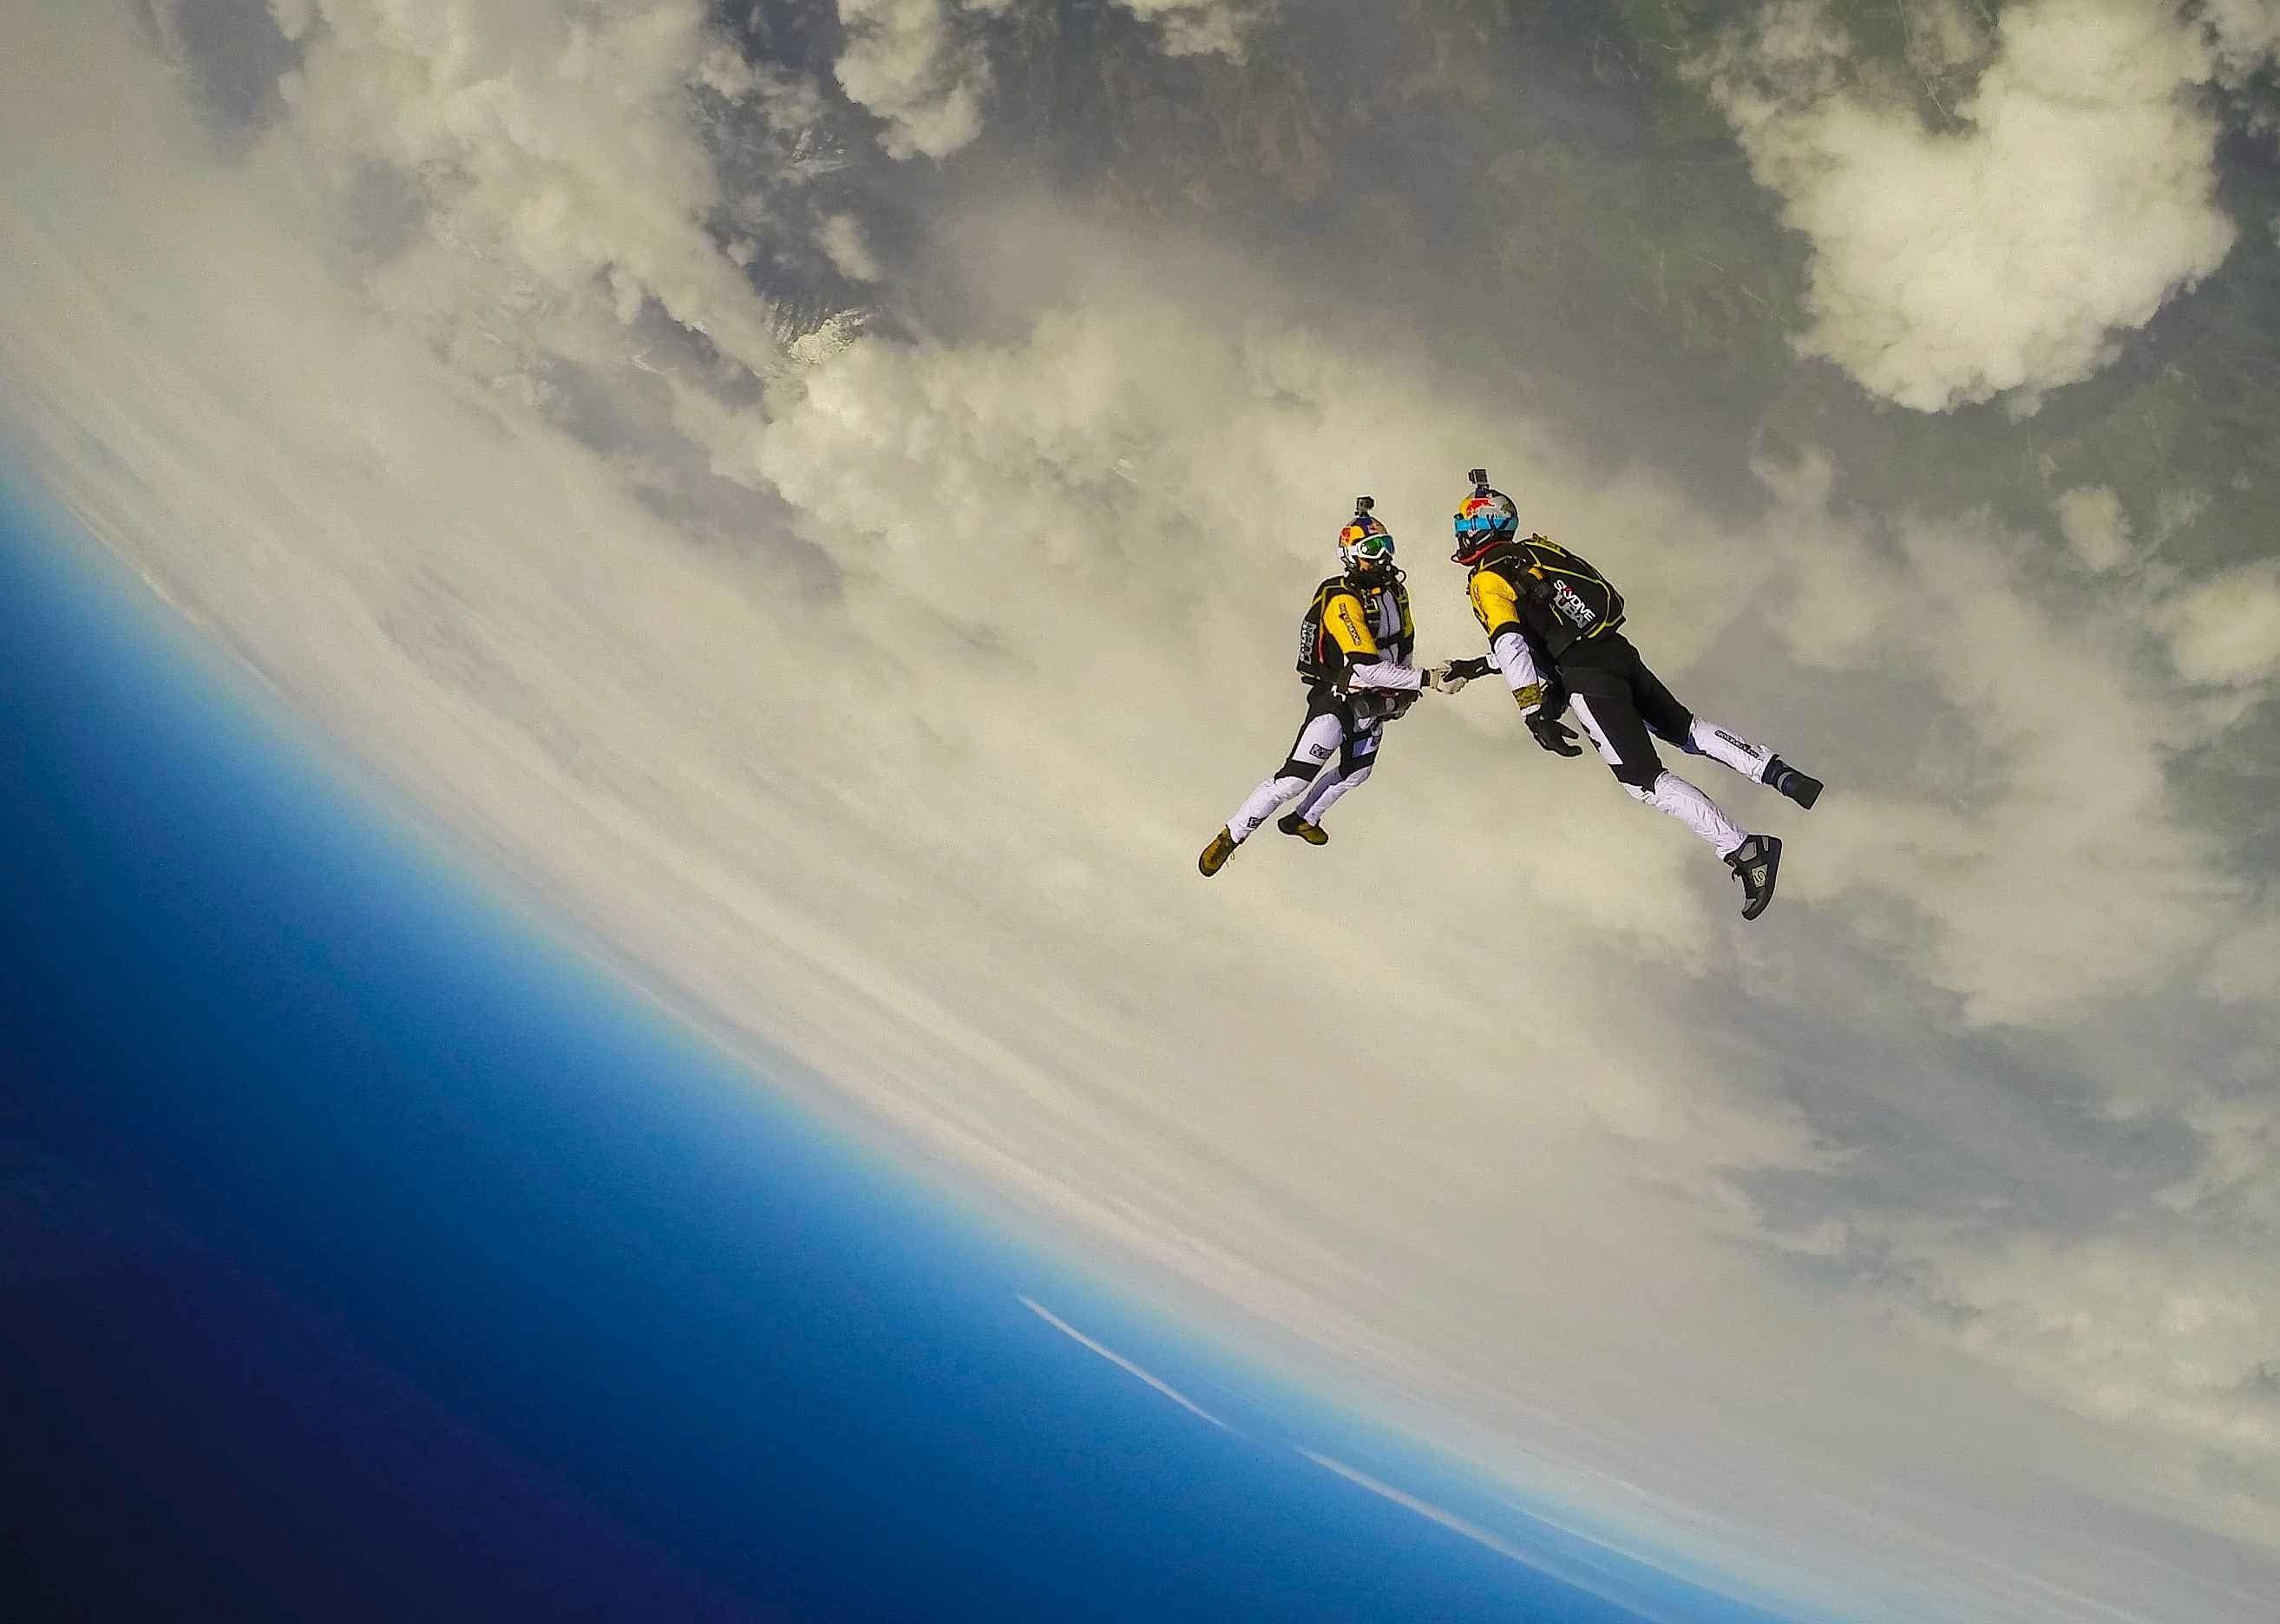 Lingerie Skydiving